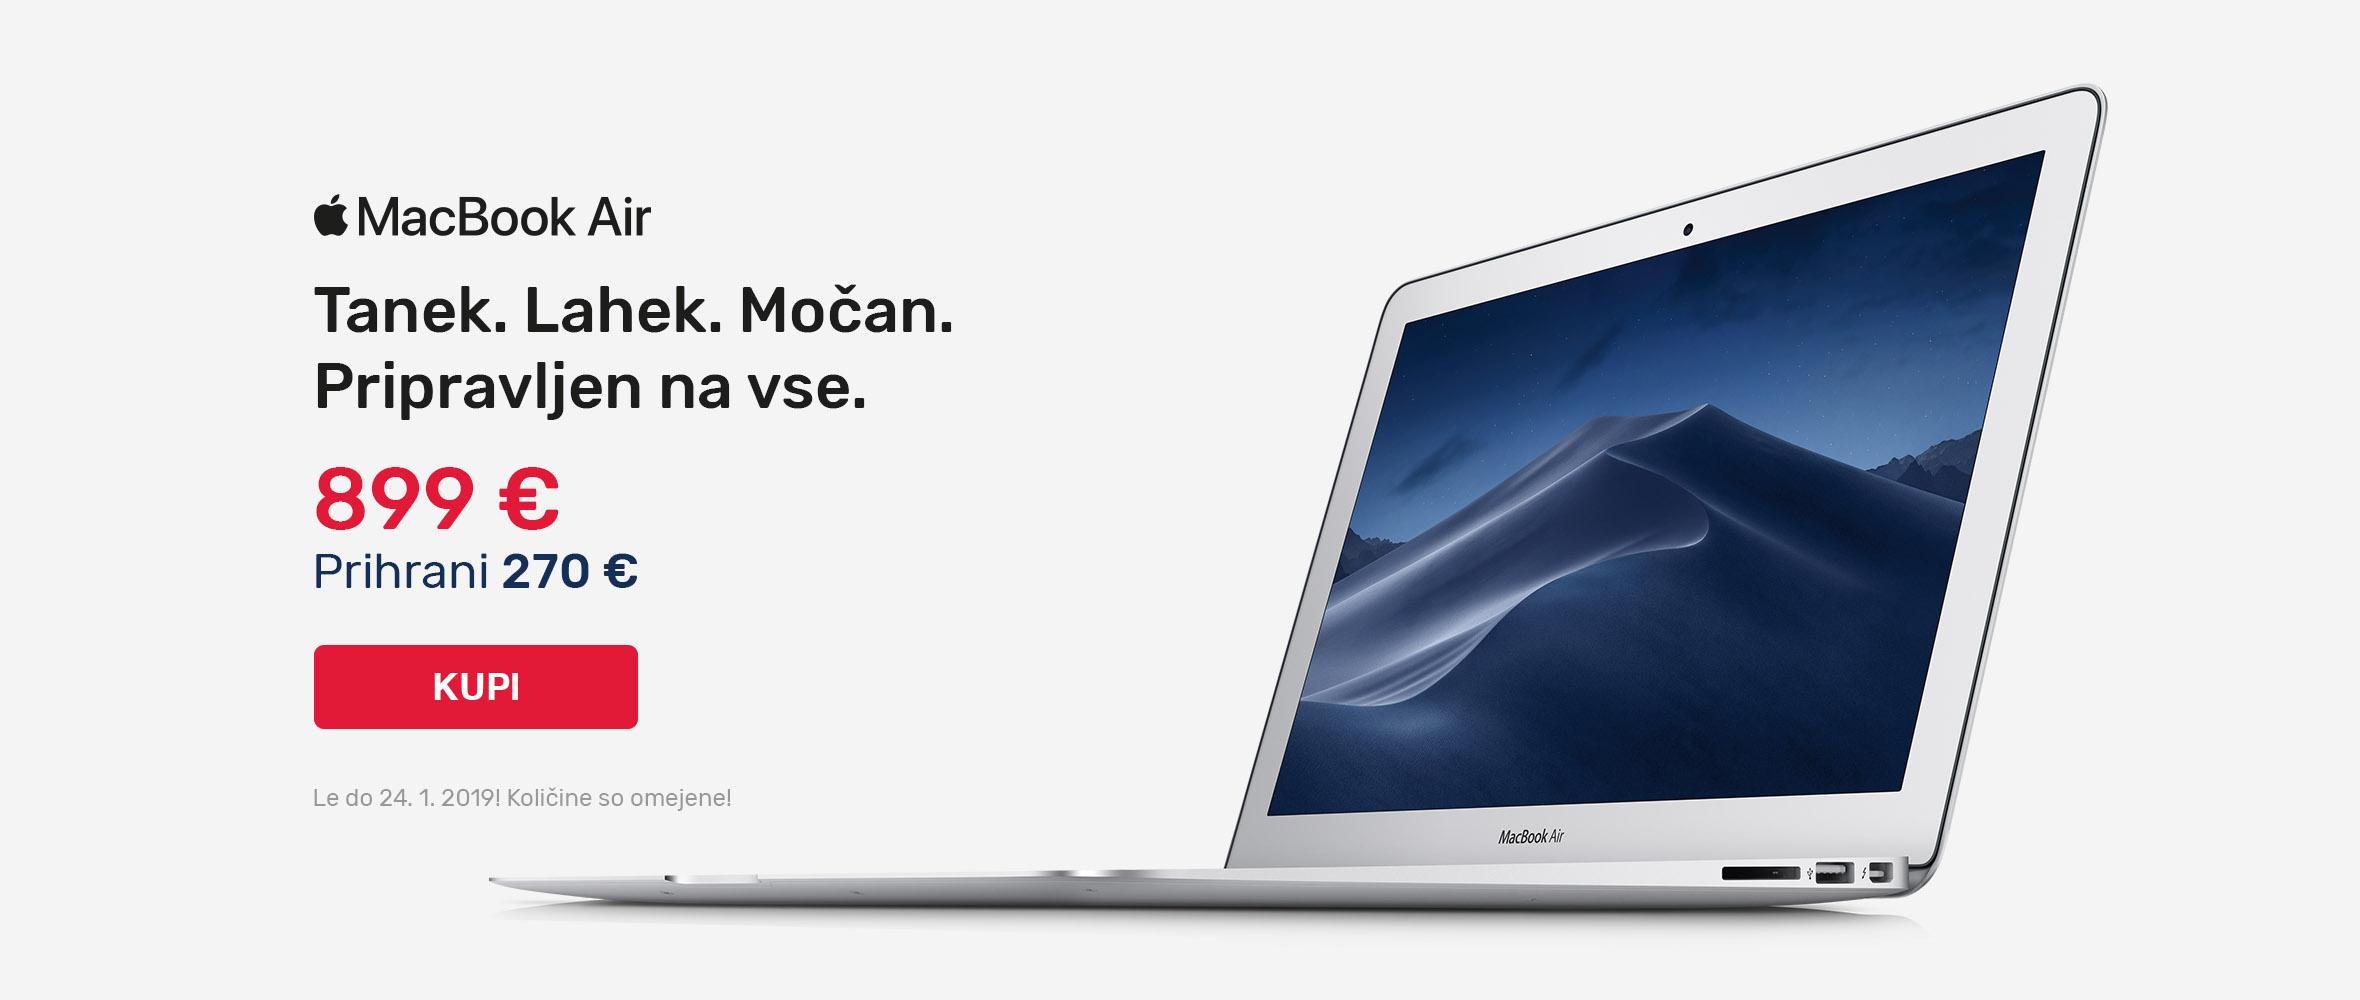 SI - MacBook Air